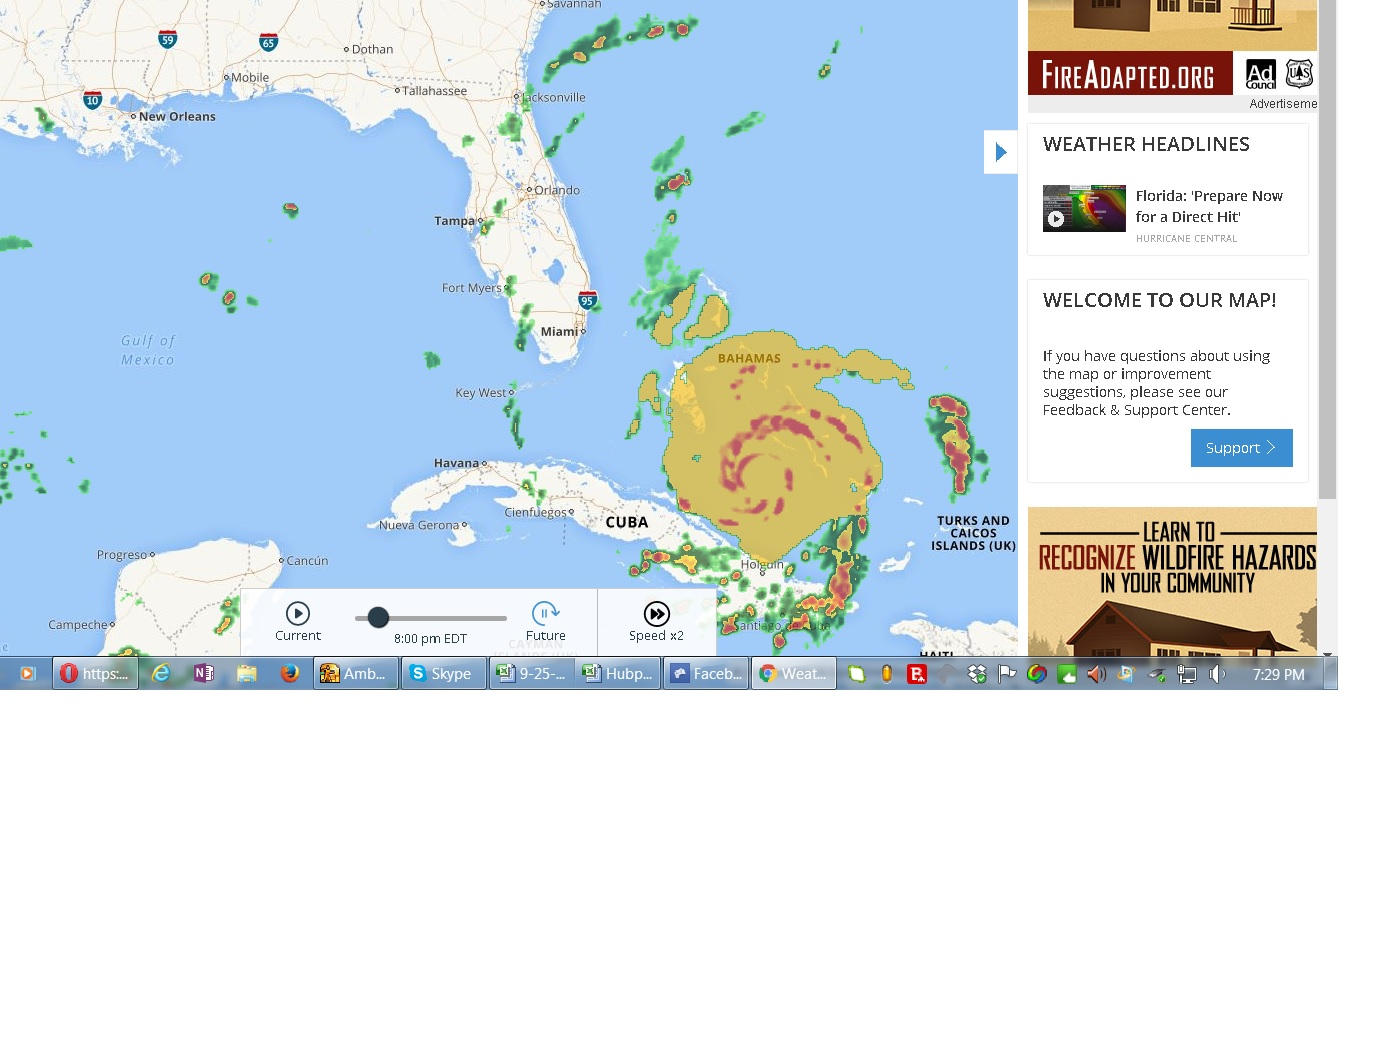 https://weather.com/weather/radar/interactive/l/48640:4:US